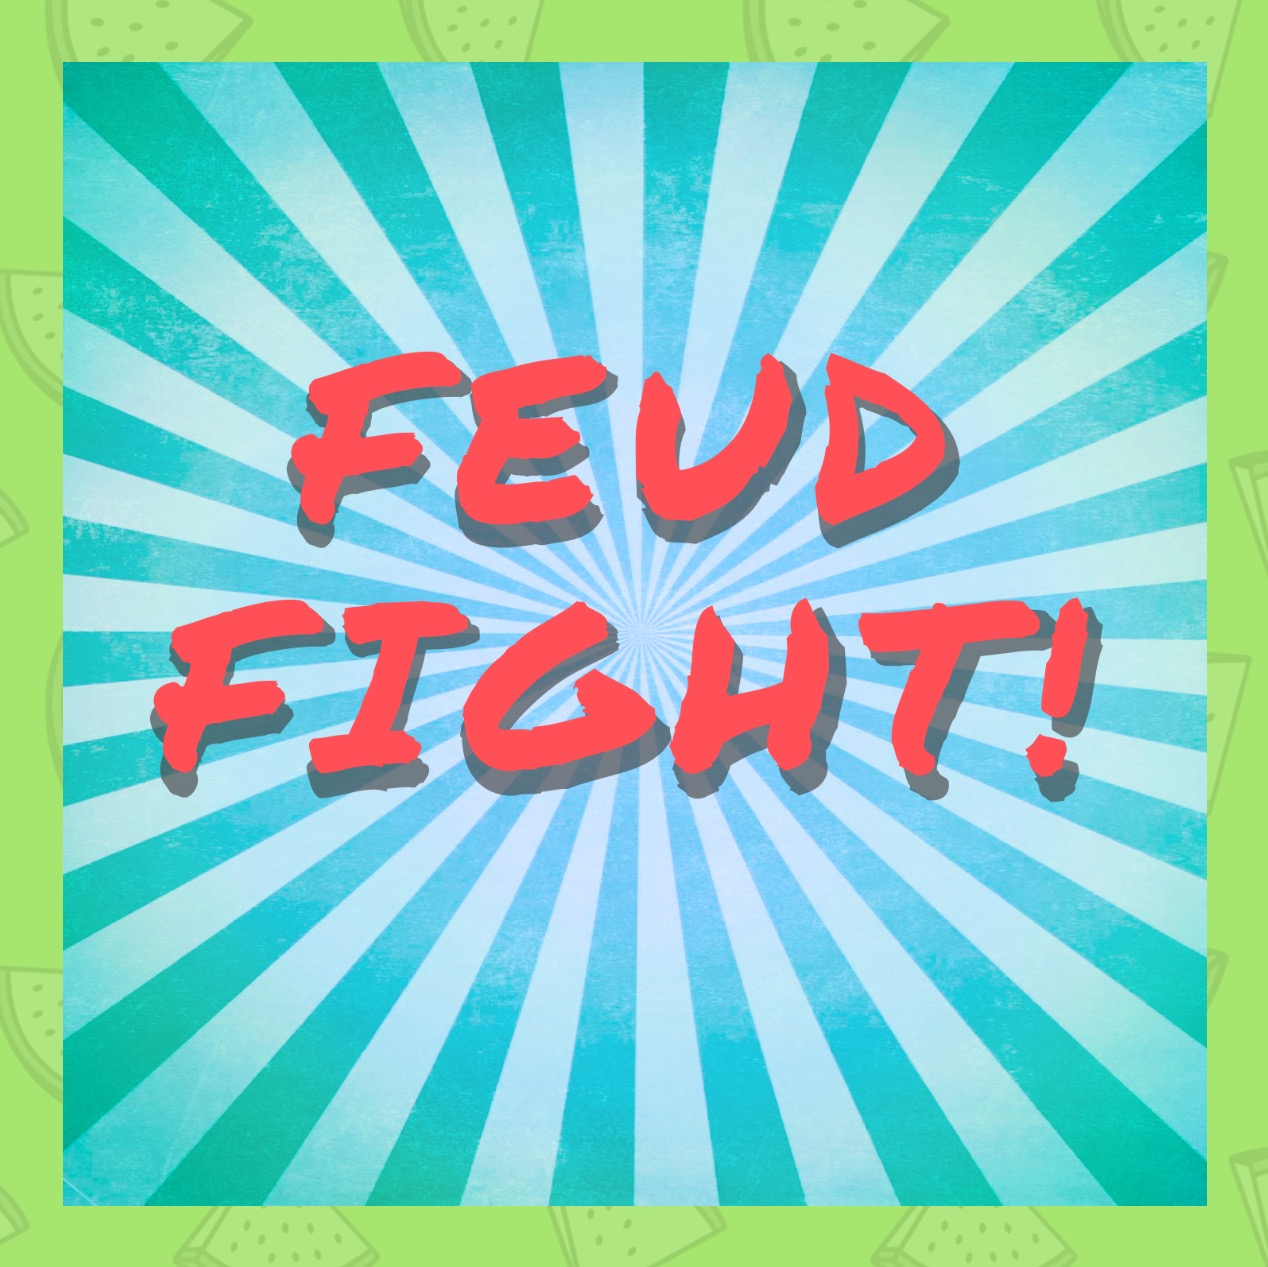 Feud Fight